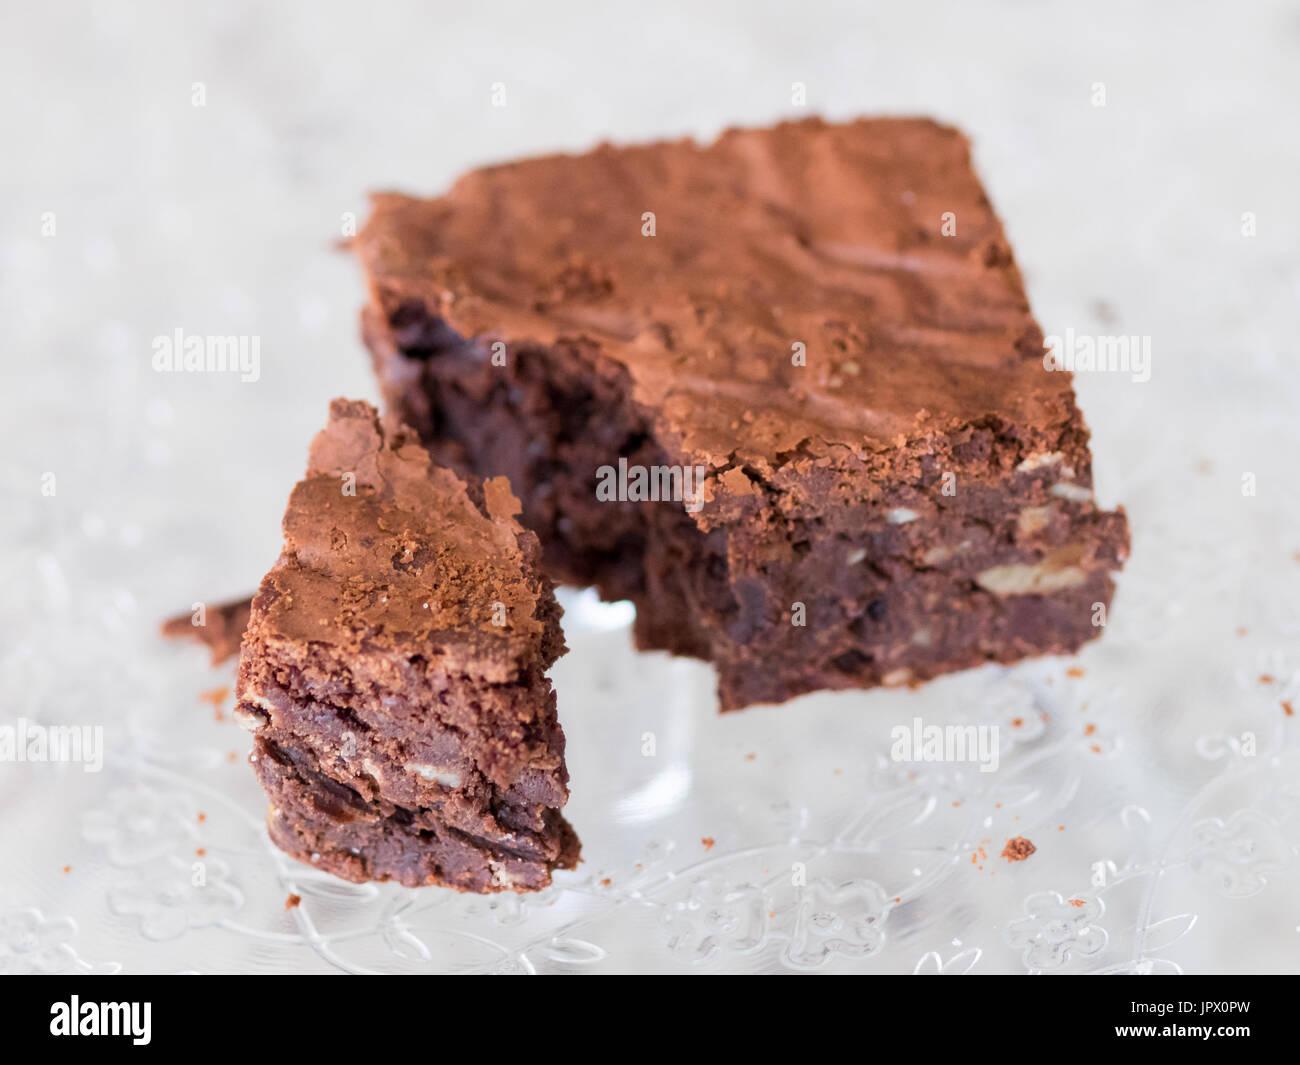 A chocolate fudge brownie. - Stock Image